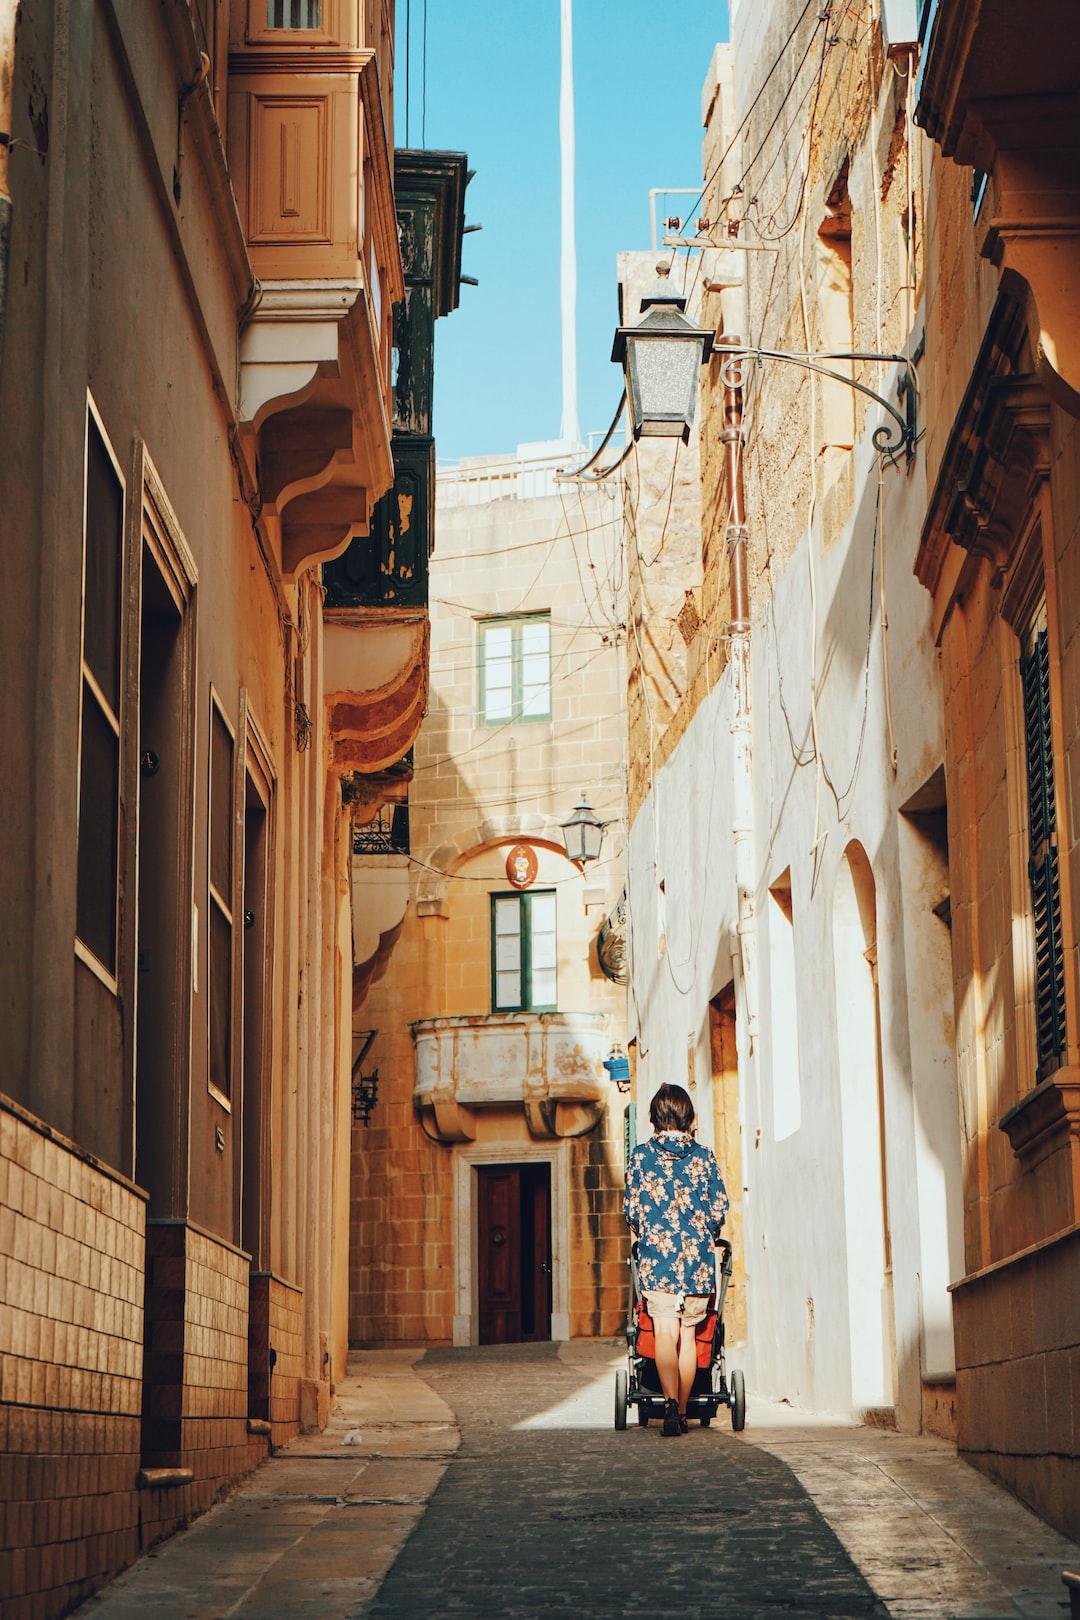 Strolling around Victoria, Malta